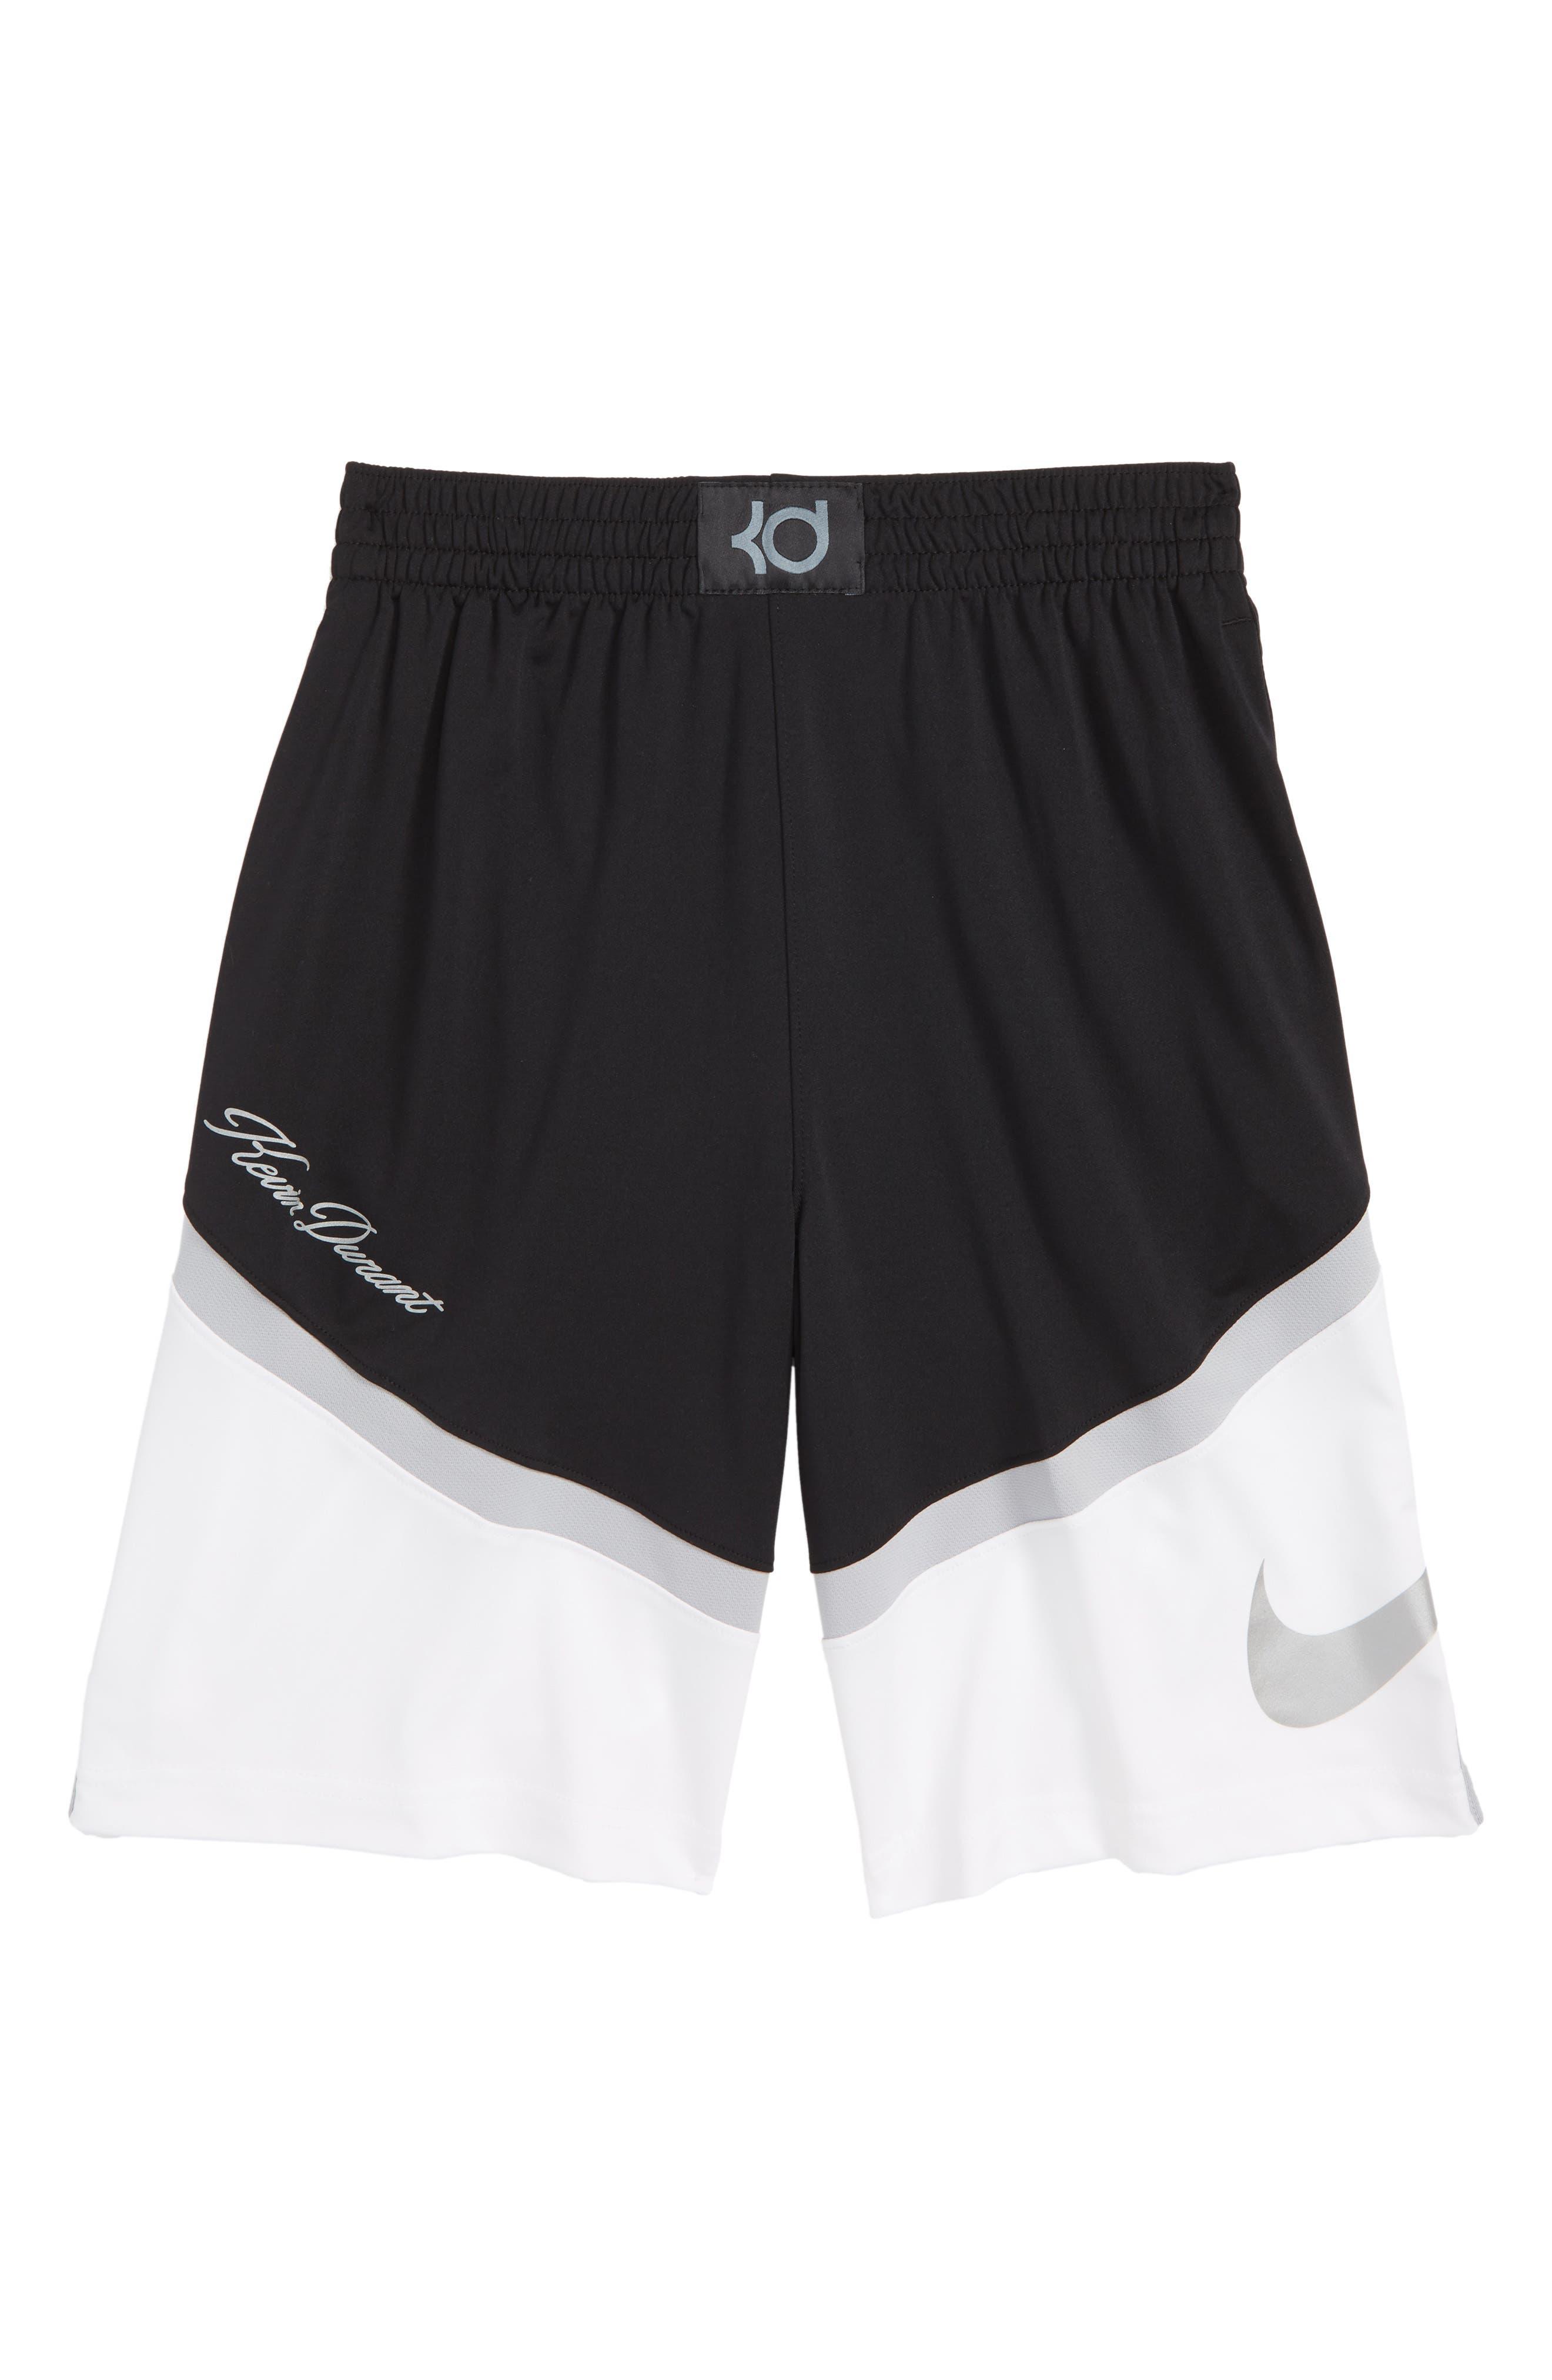 KD Dry Seasonal Shorts,                         Main,                         color, BLACK/ WHITE